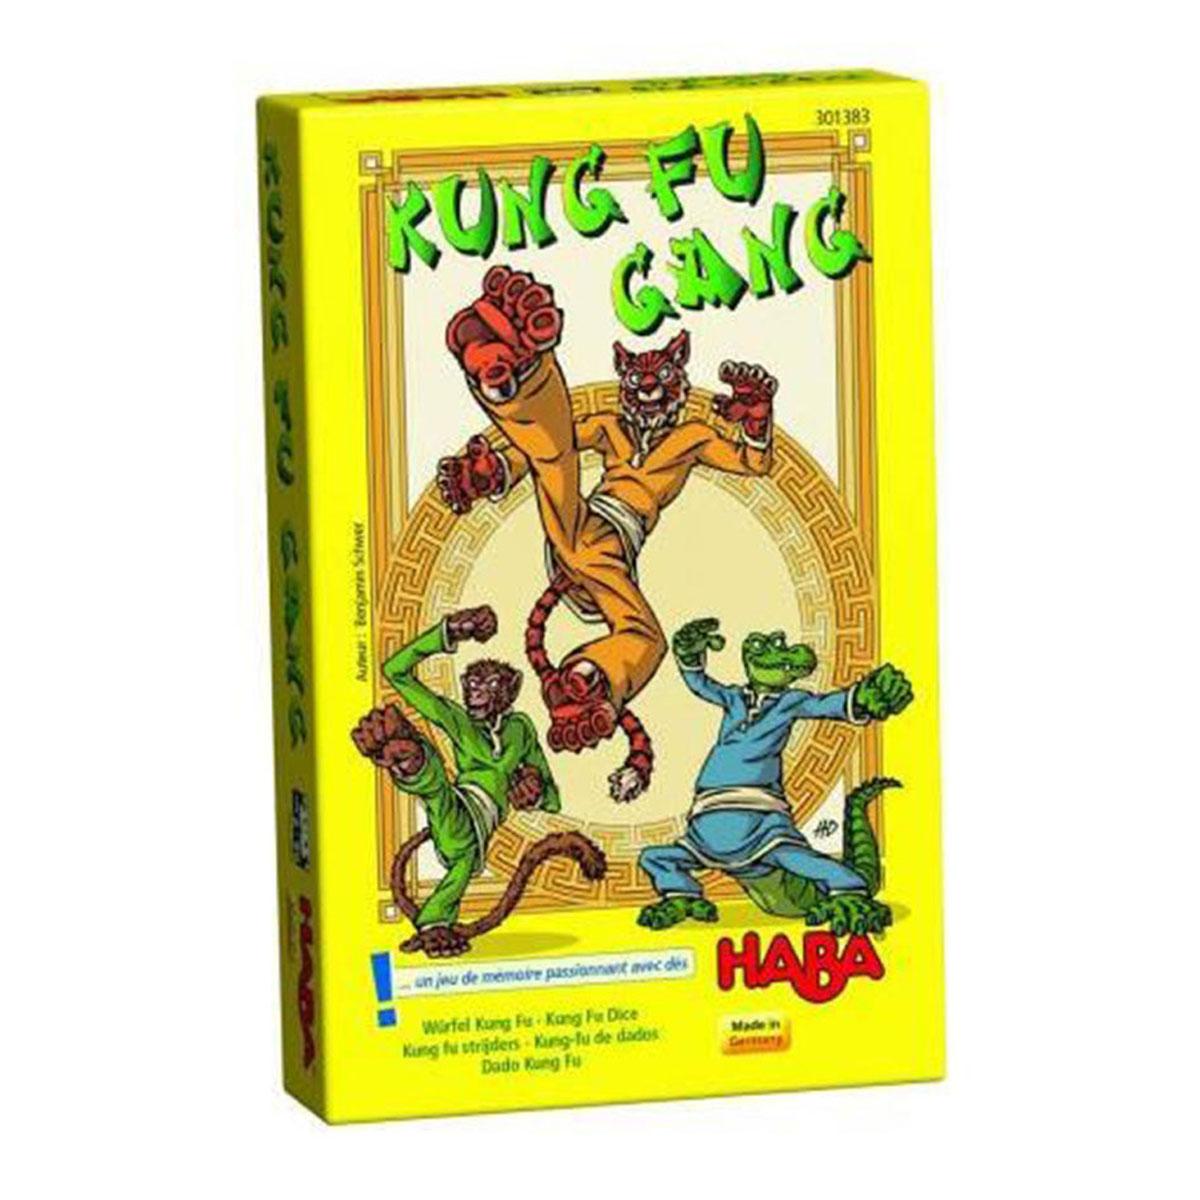 Kung Fu gang - Haba